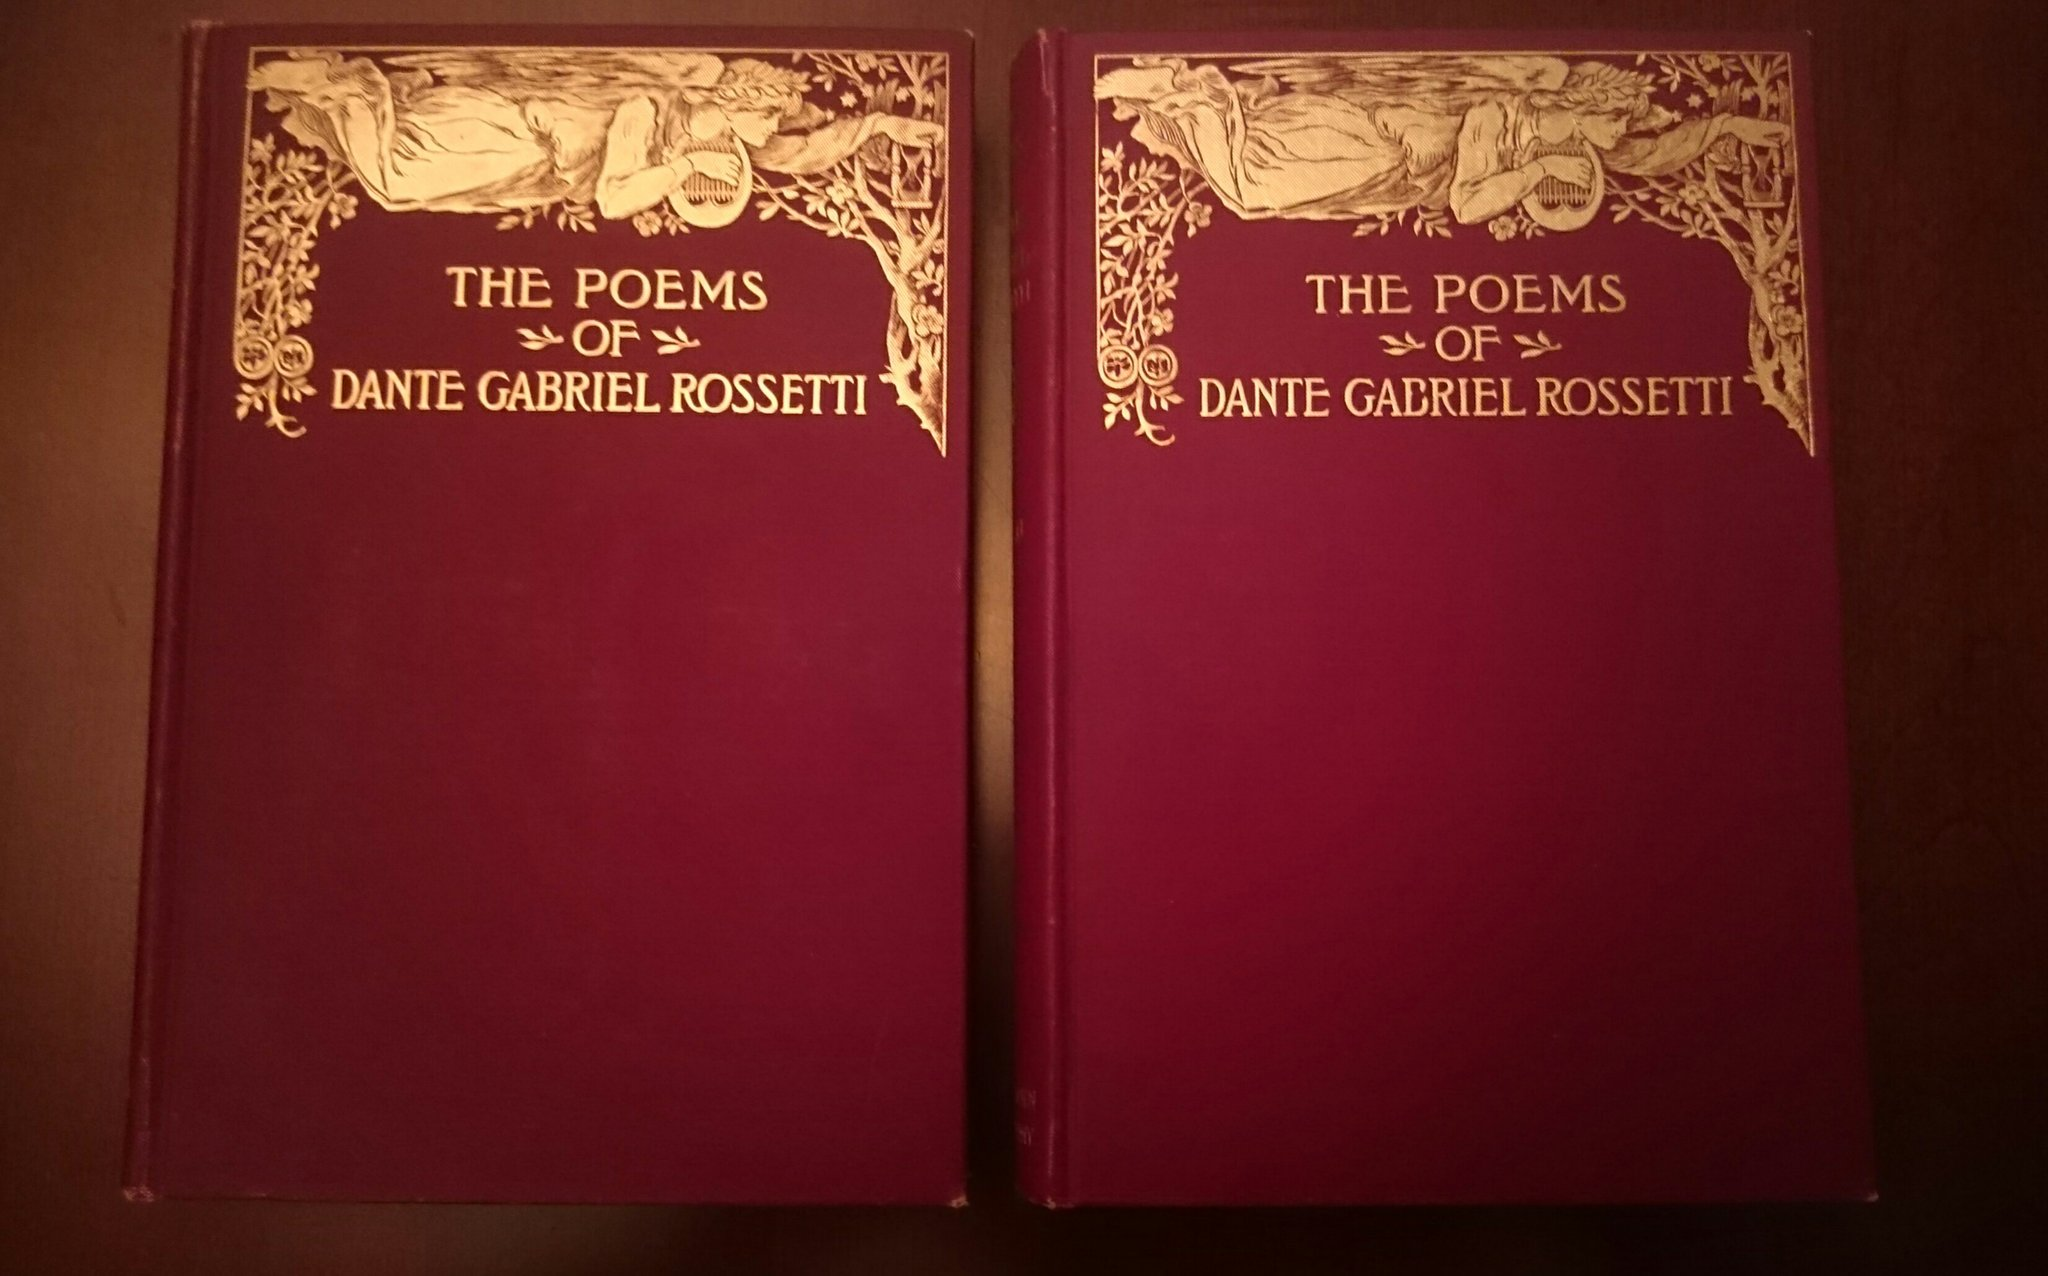 Dante Gabriel Rossetti Poems 6